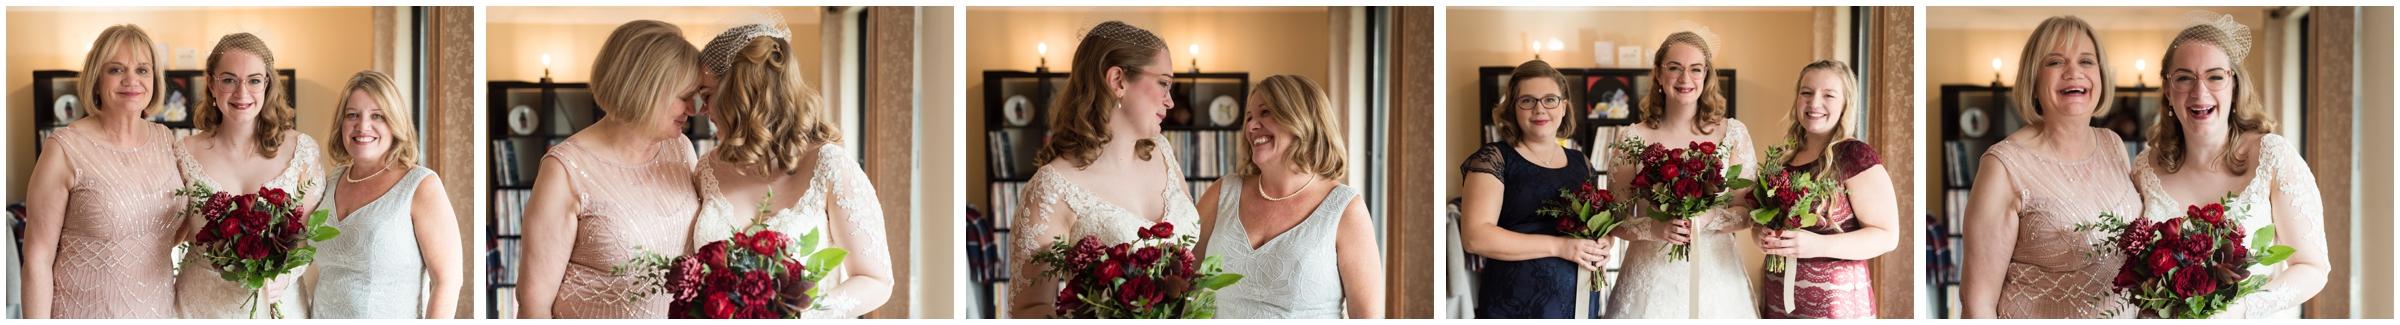 Ottaw Wedding Allison Andrew - (Selena Phillips-Boyle)_0021.jpg